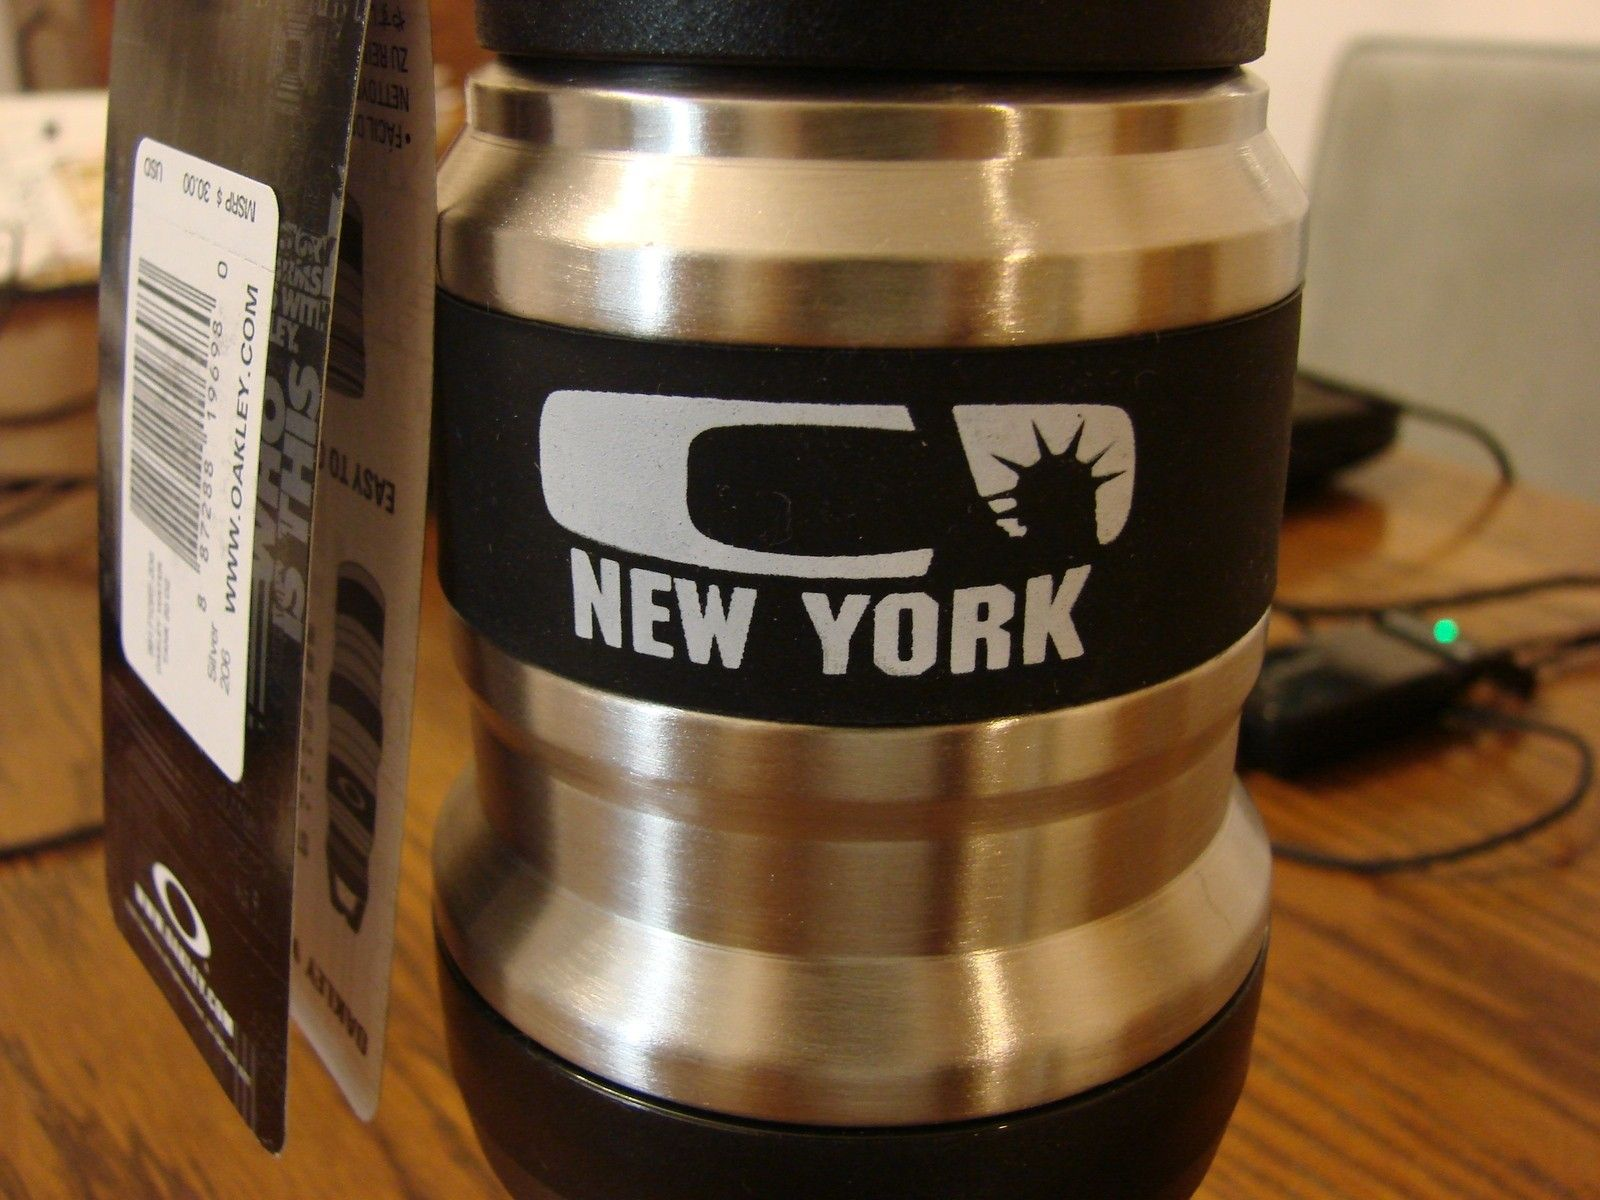 SOLD 20 OZ STAINLESS STEEL NEW YORK CITY WATER TANK - DSC00152.JPG